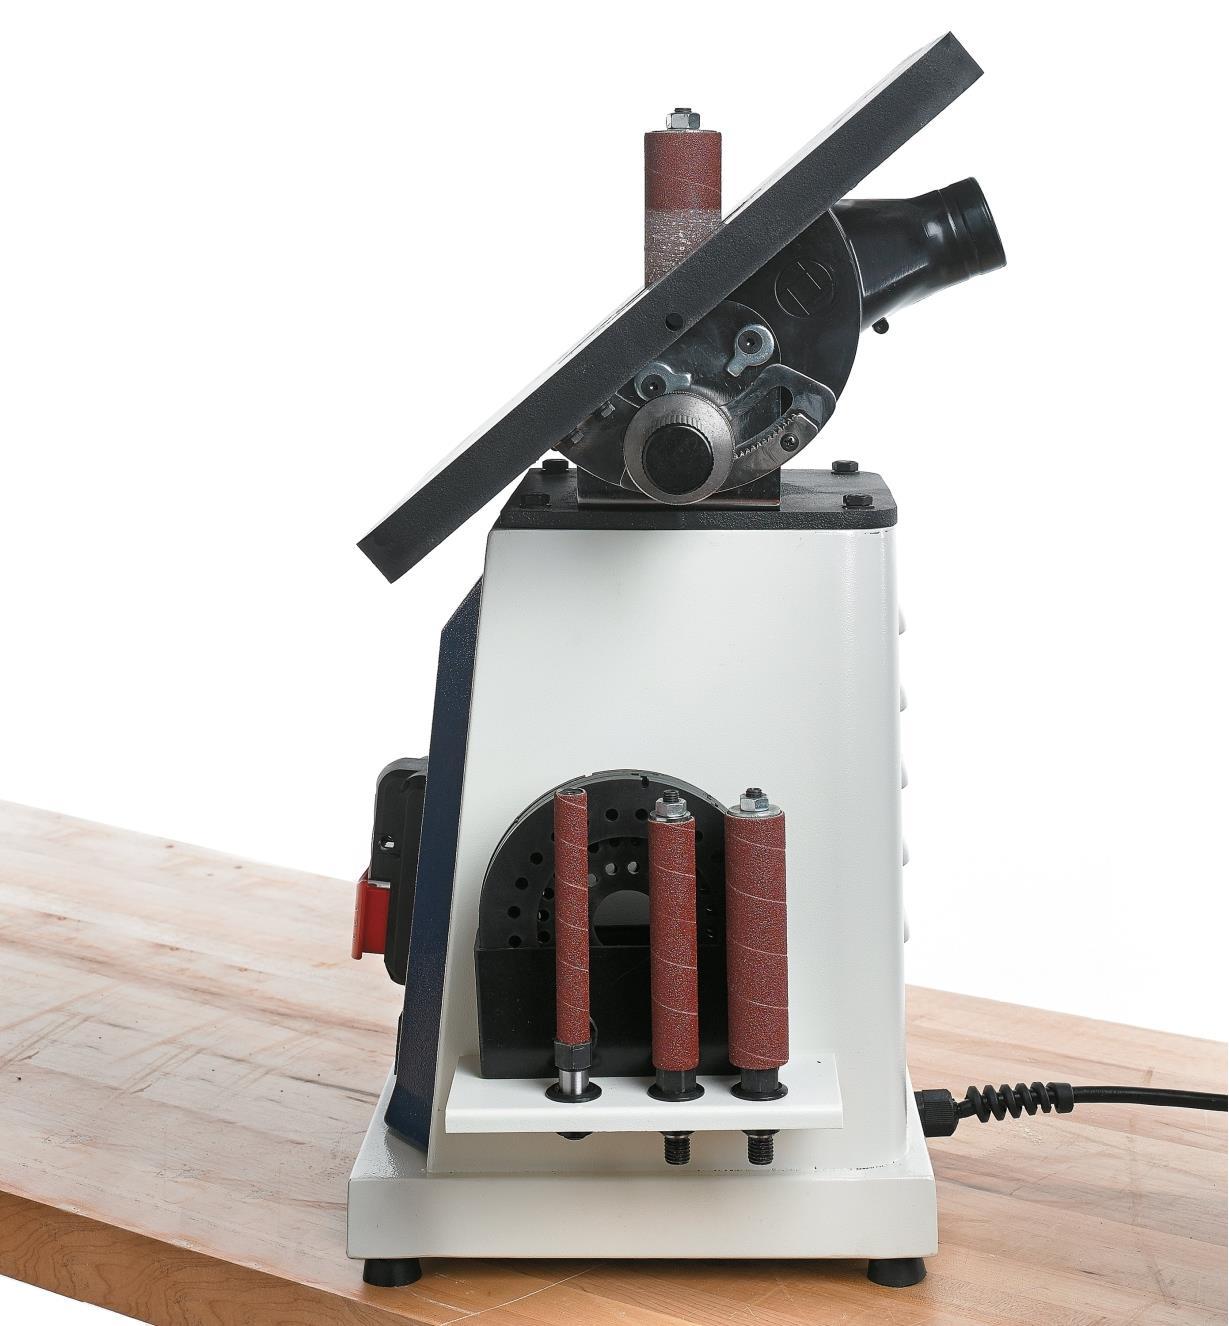 Rikon Oscillating Spindle Sander Lee Valley Tools